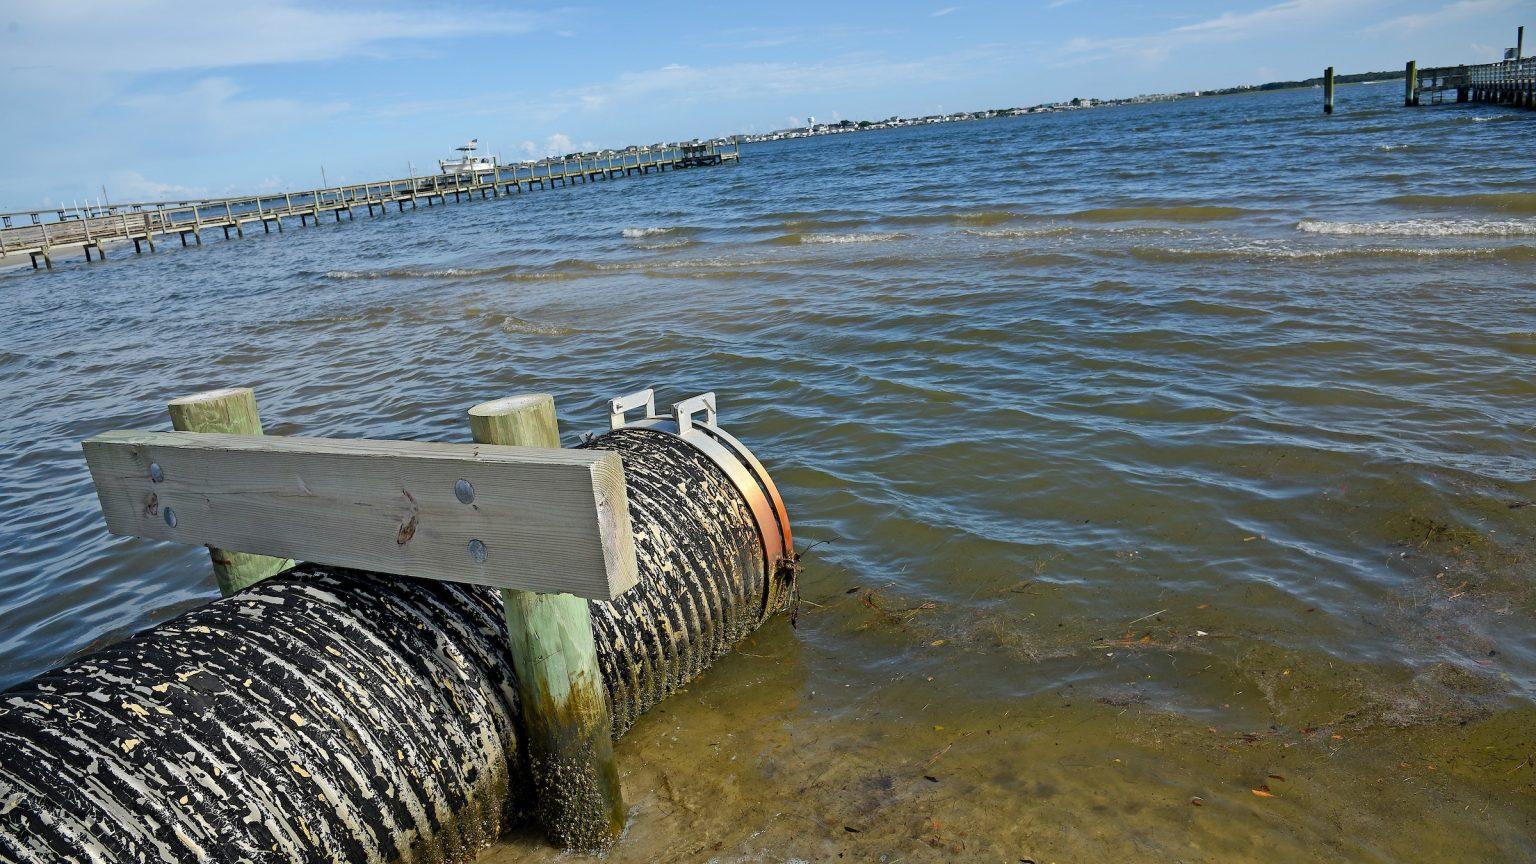 Stormwater drain run-off pipe